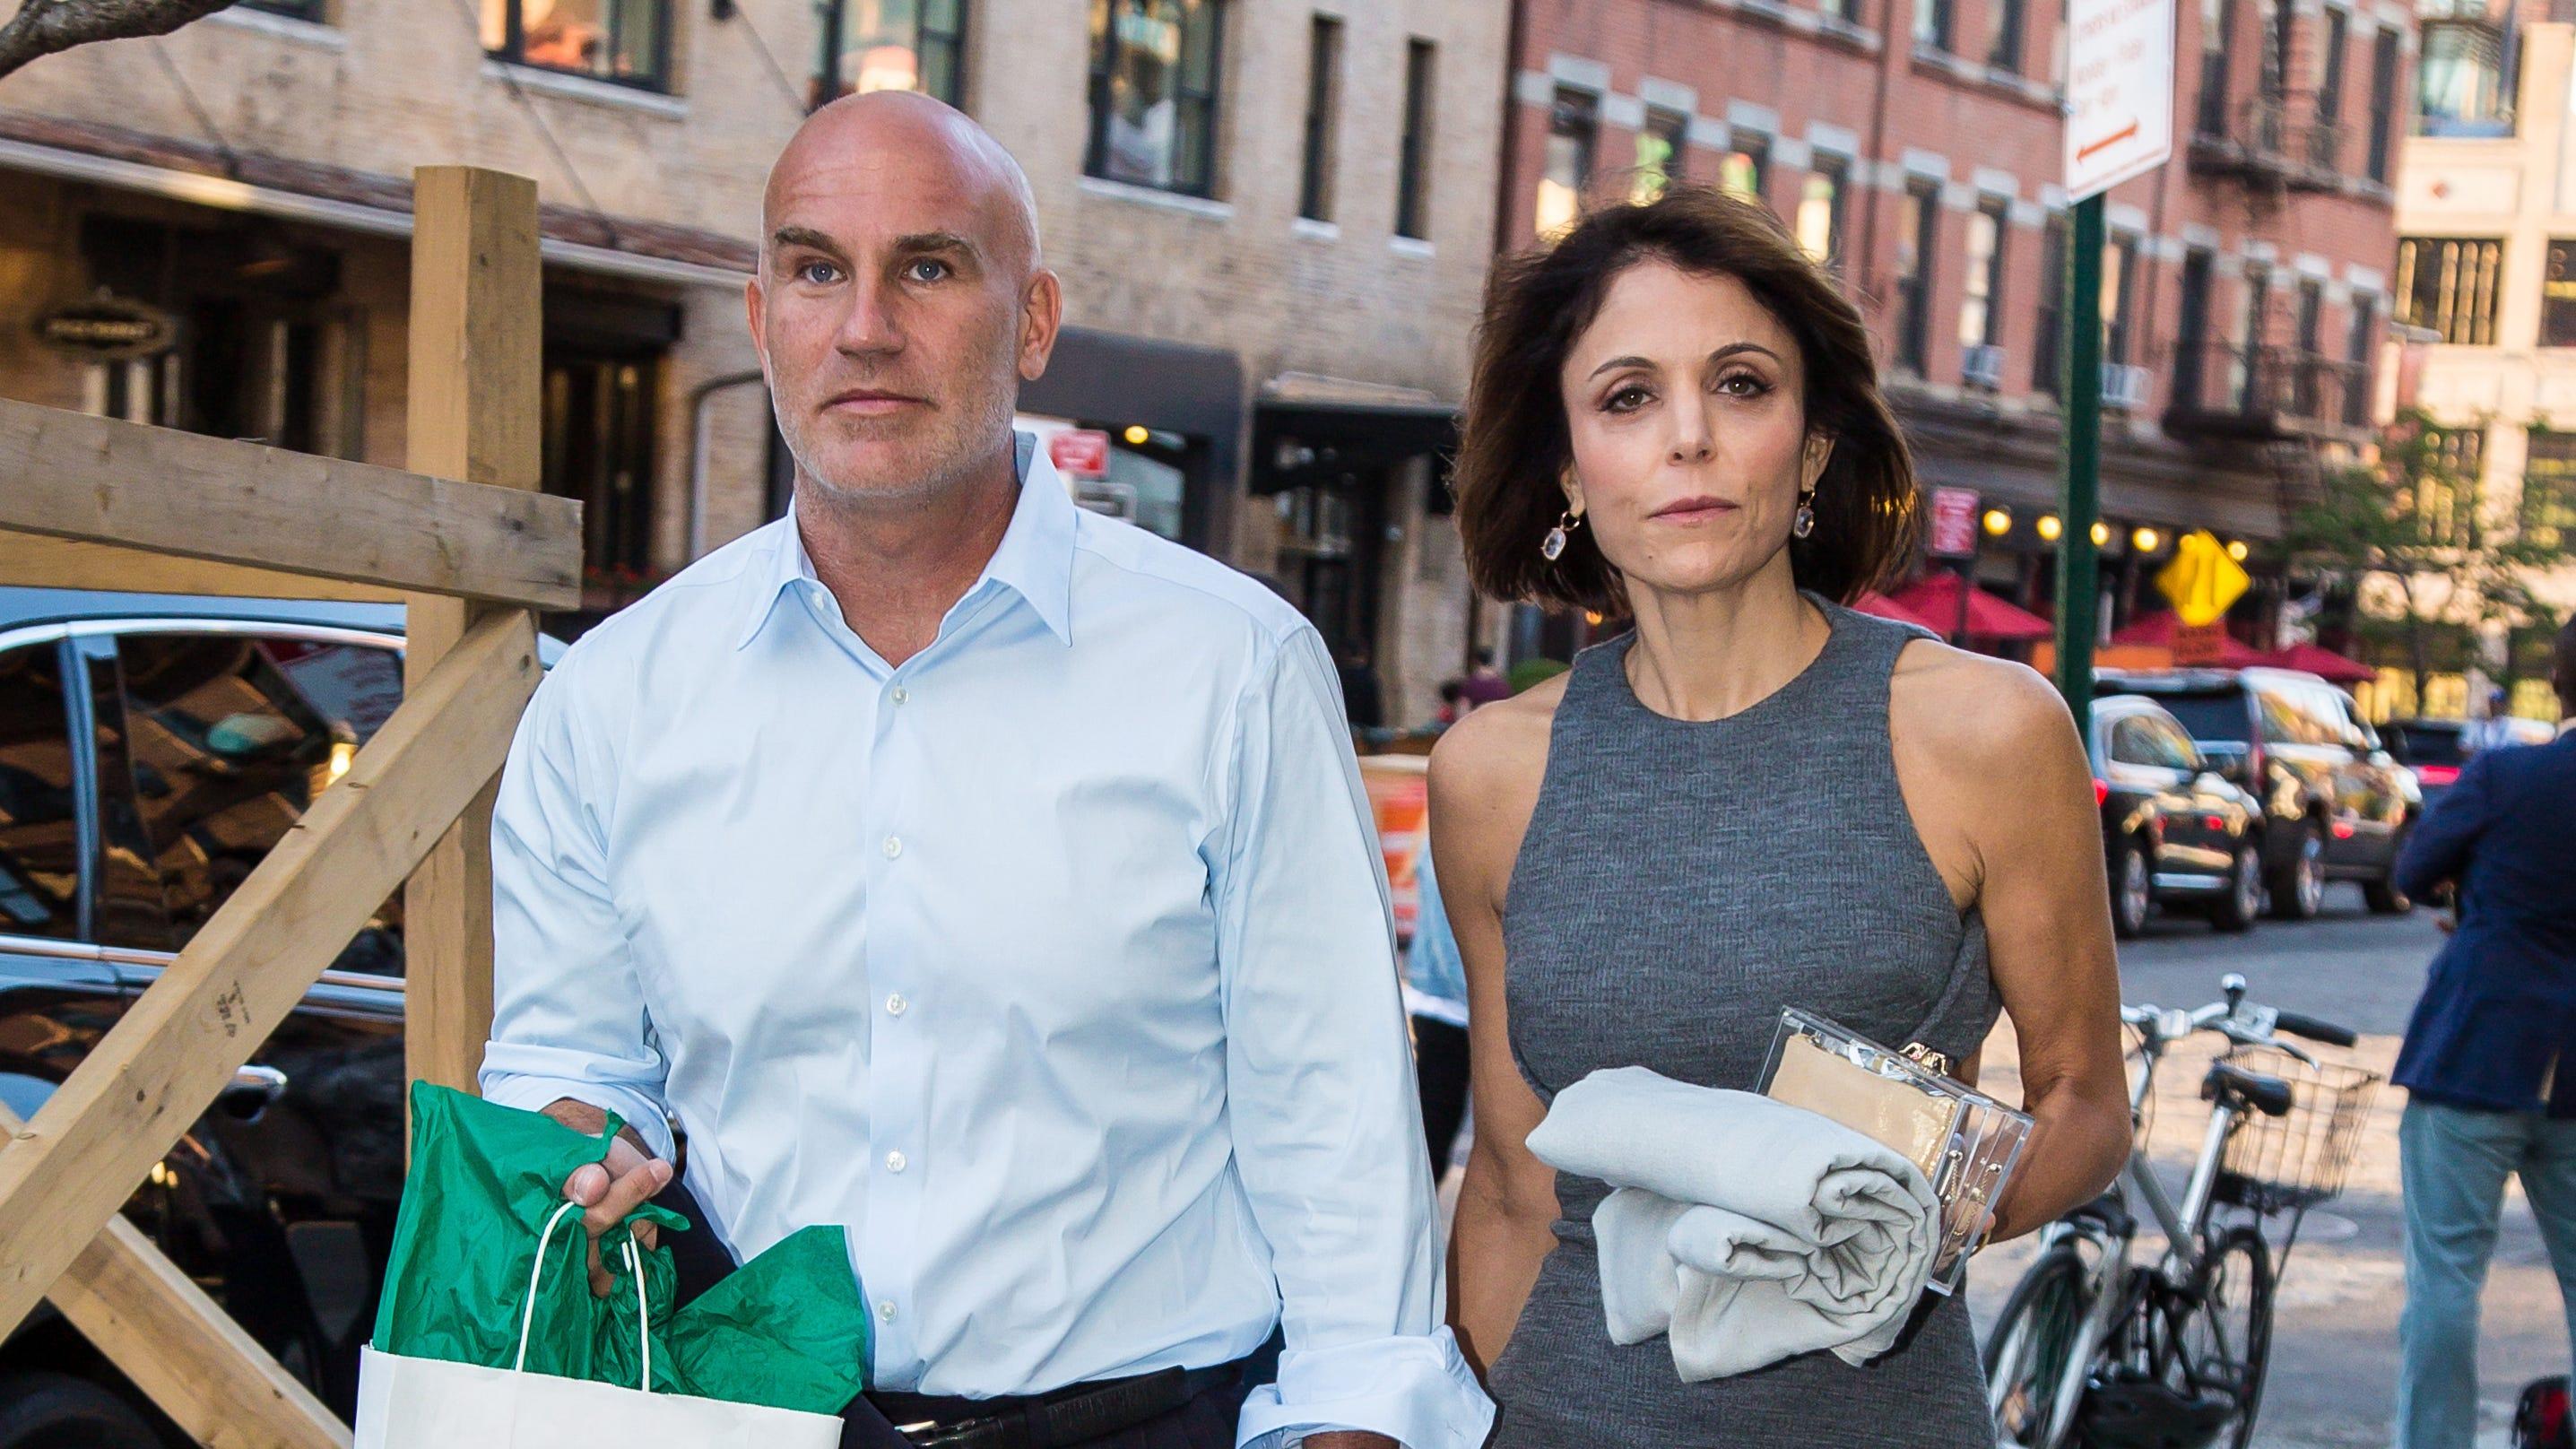 'RHONY' star Bethenny Frankel's ex-boyfriend Dennis Shields found dead in Trump Tower